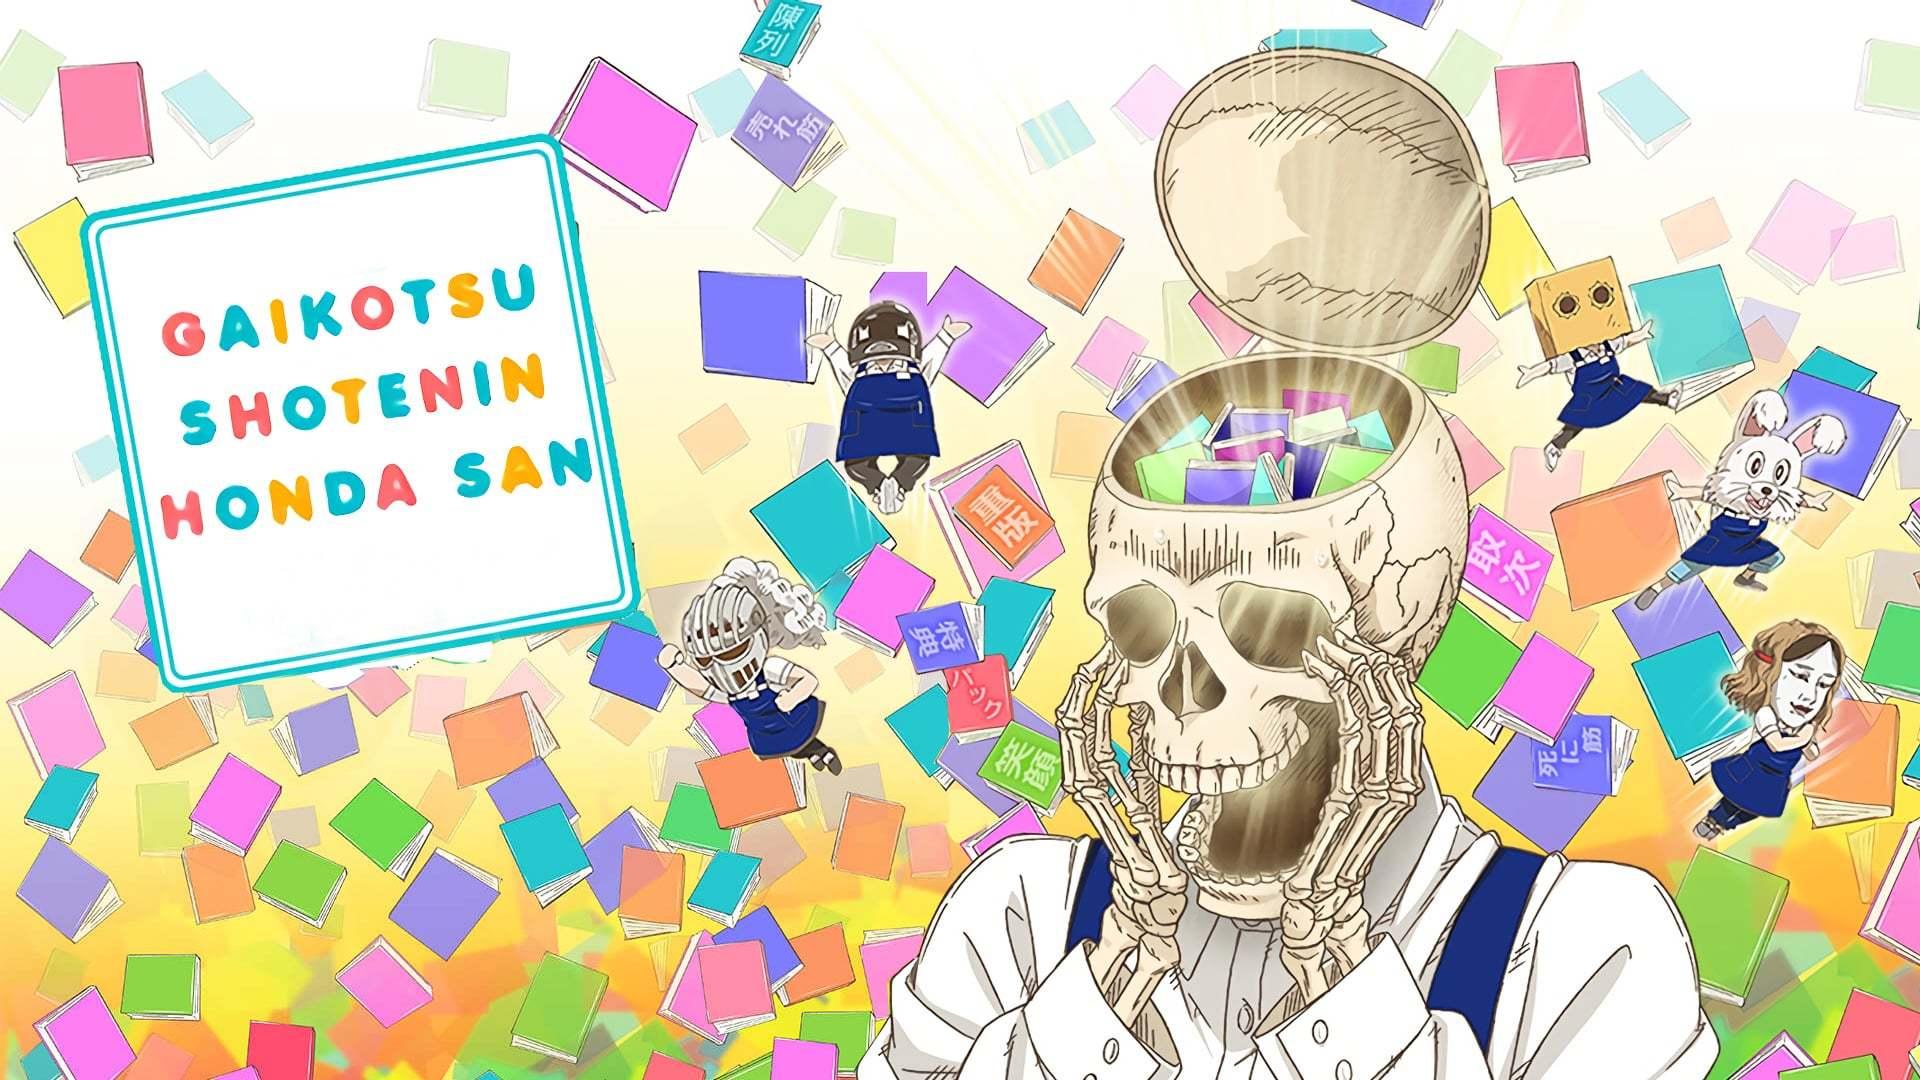 Кадры из фильма Книжник-скелет Хонда Gaikotsu Shotenin Honda-san 2018